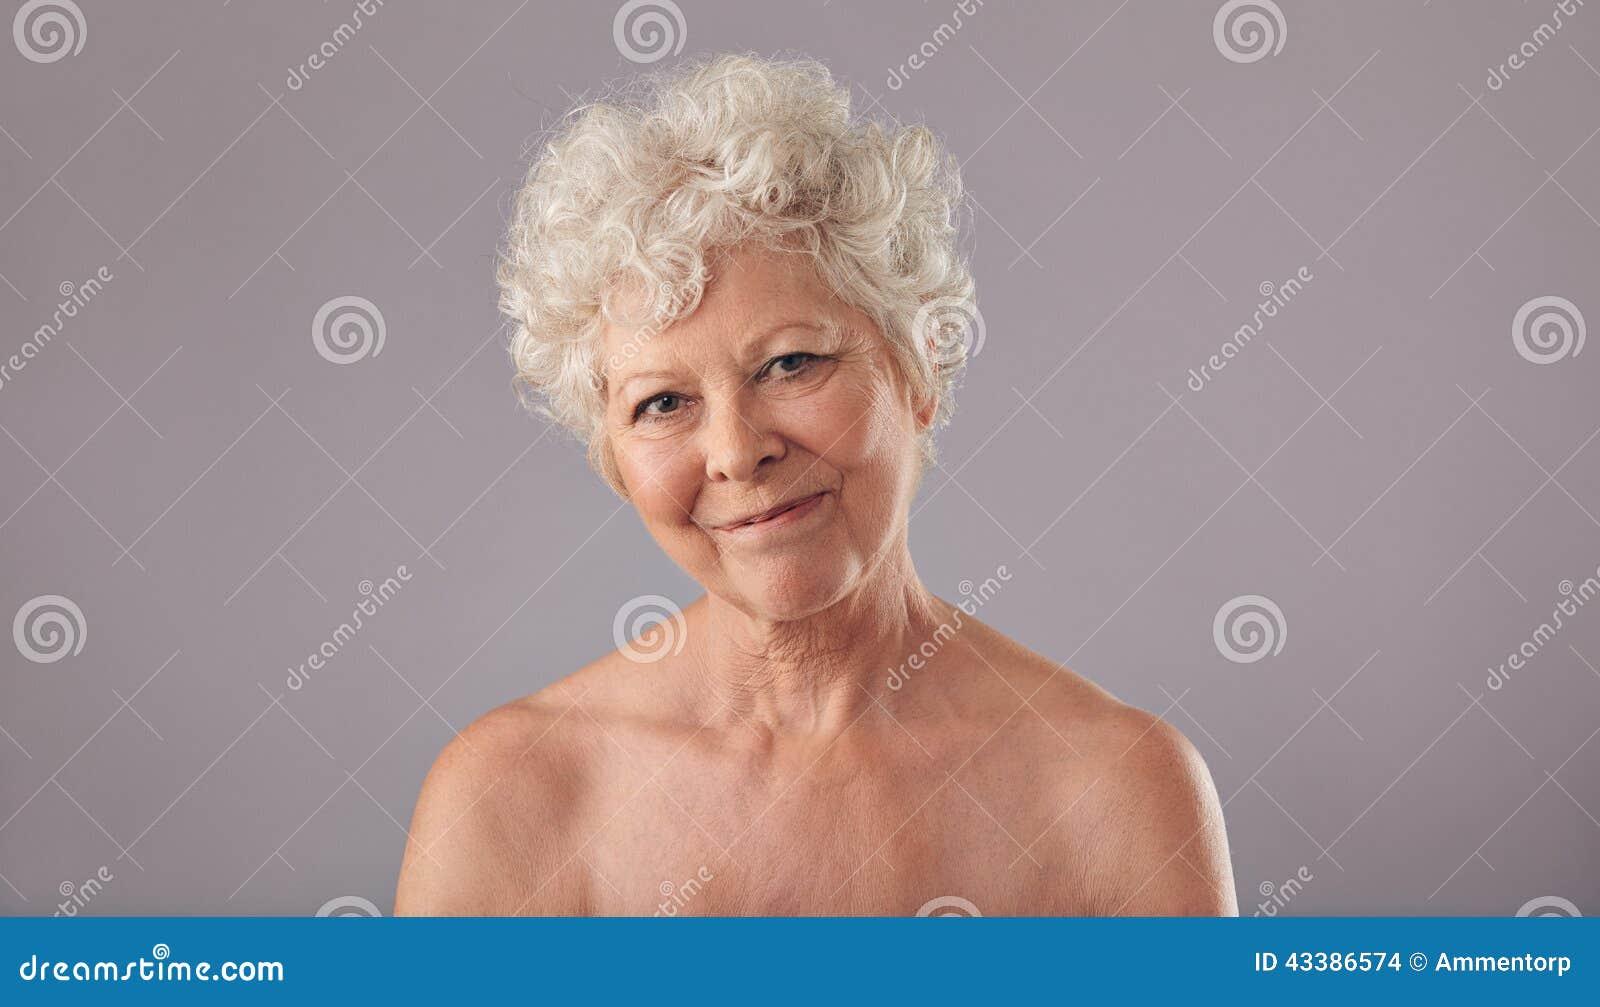 Kimberly kendall anal